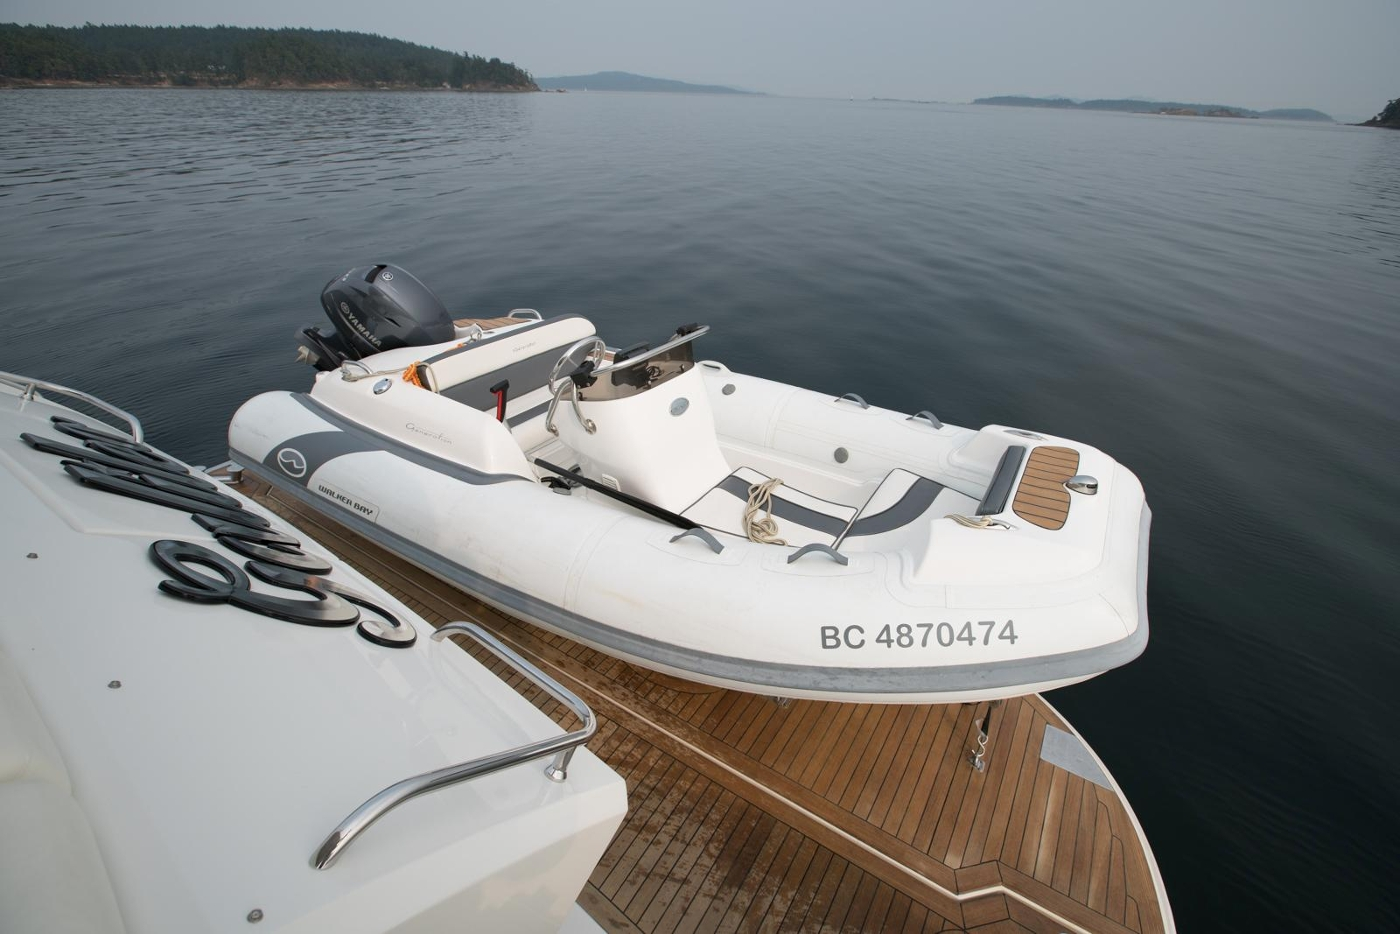 2006 Marquis Motor Yacht, Hydraulic swim platform